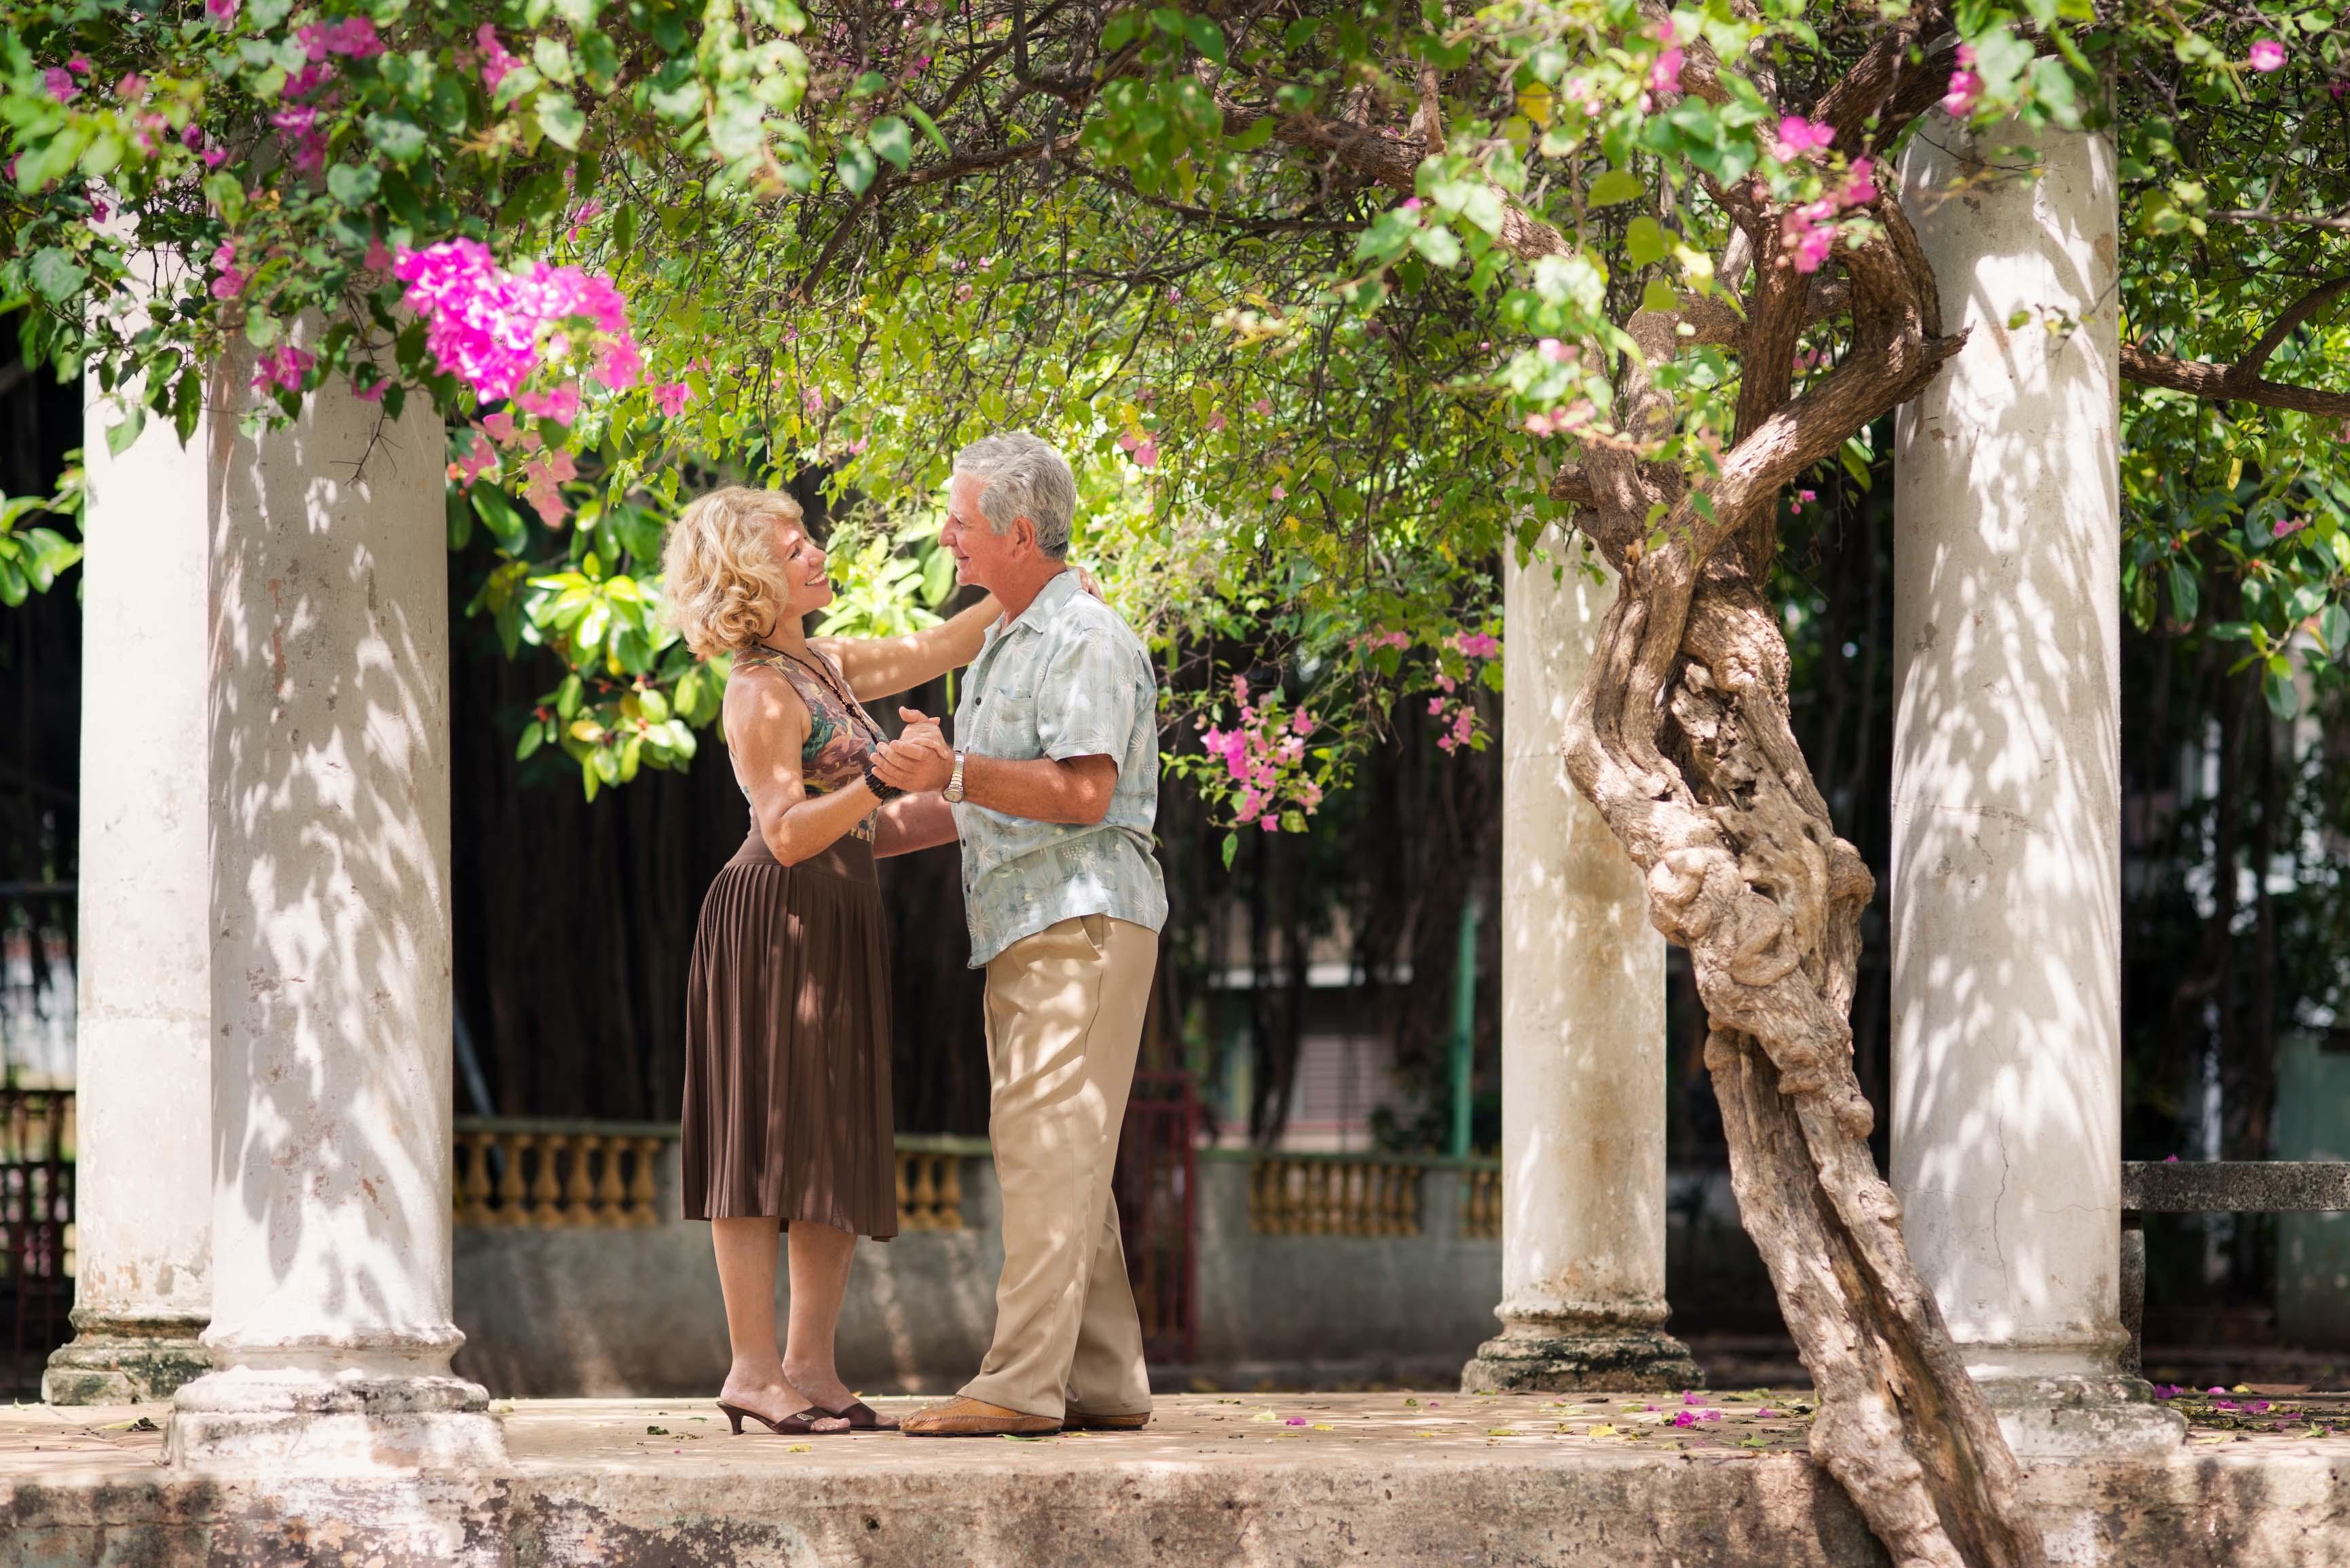 Happy senior couple dancing latin american dance for fun